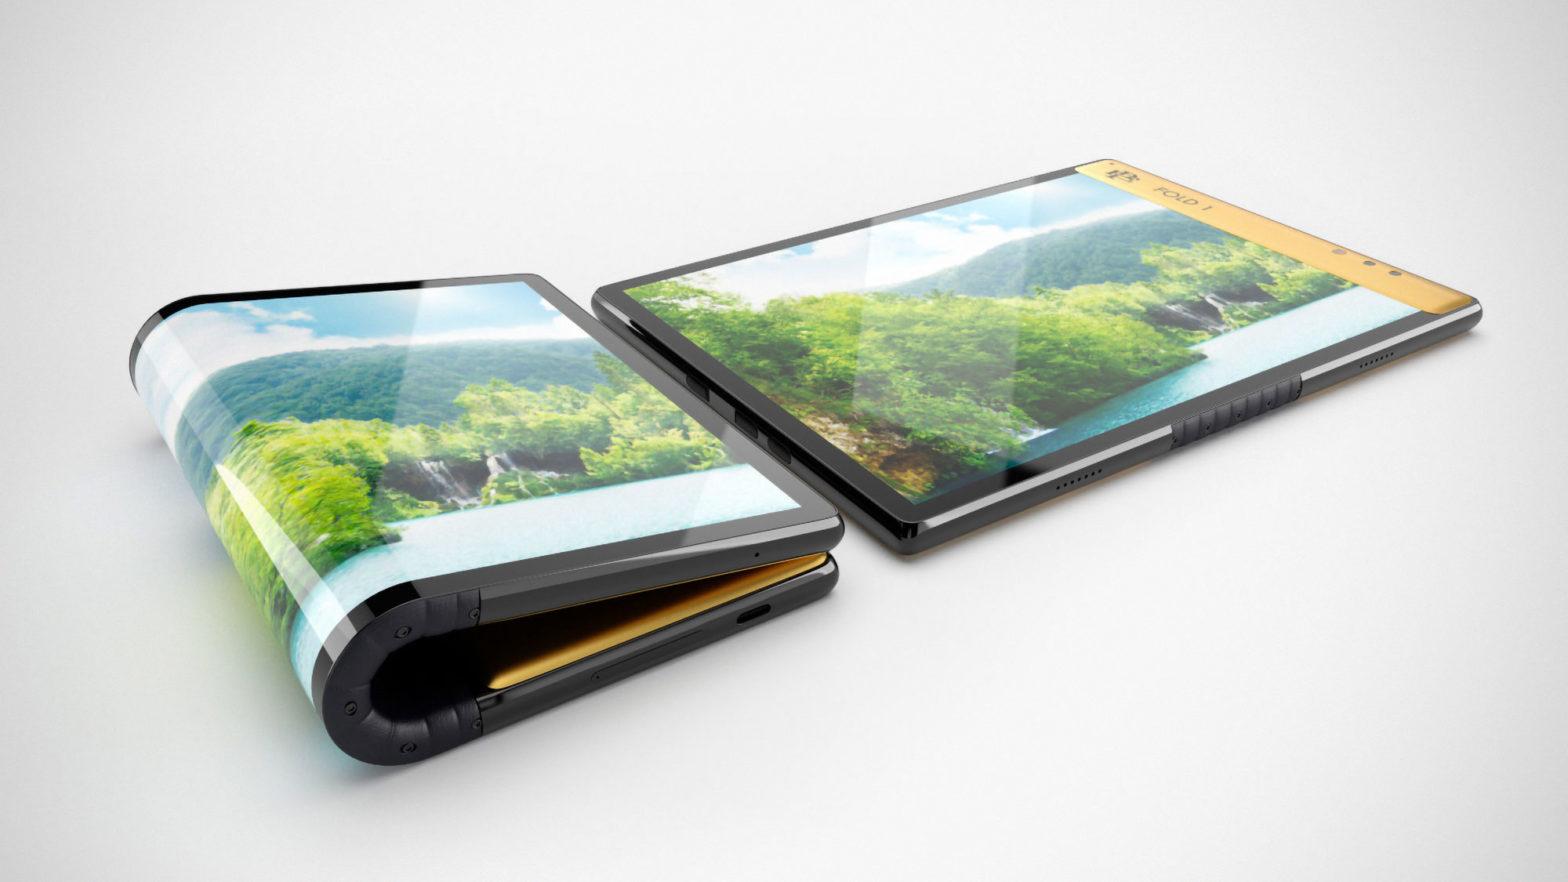 Escobar Fold 1 Folding Smartphone